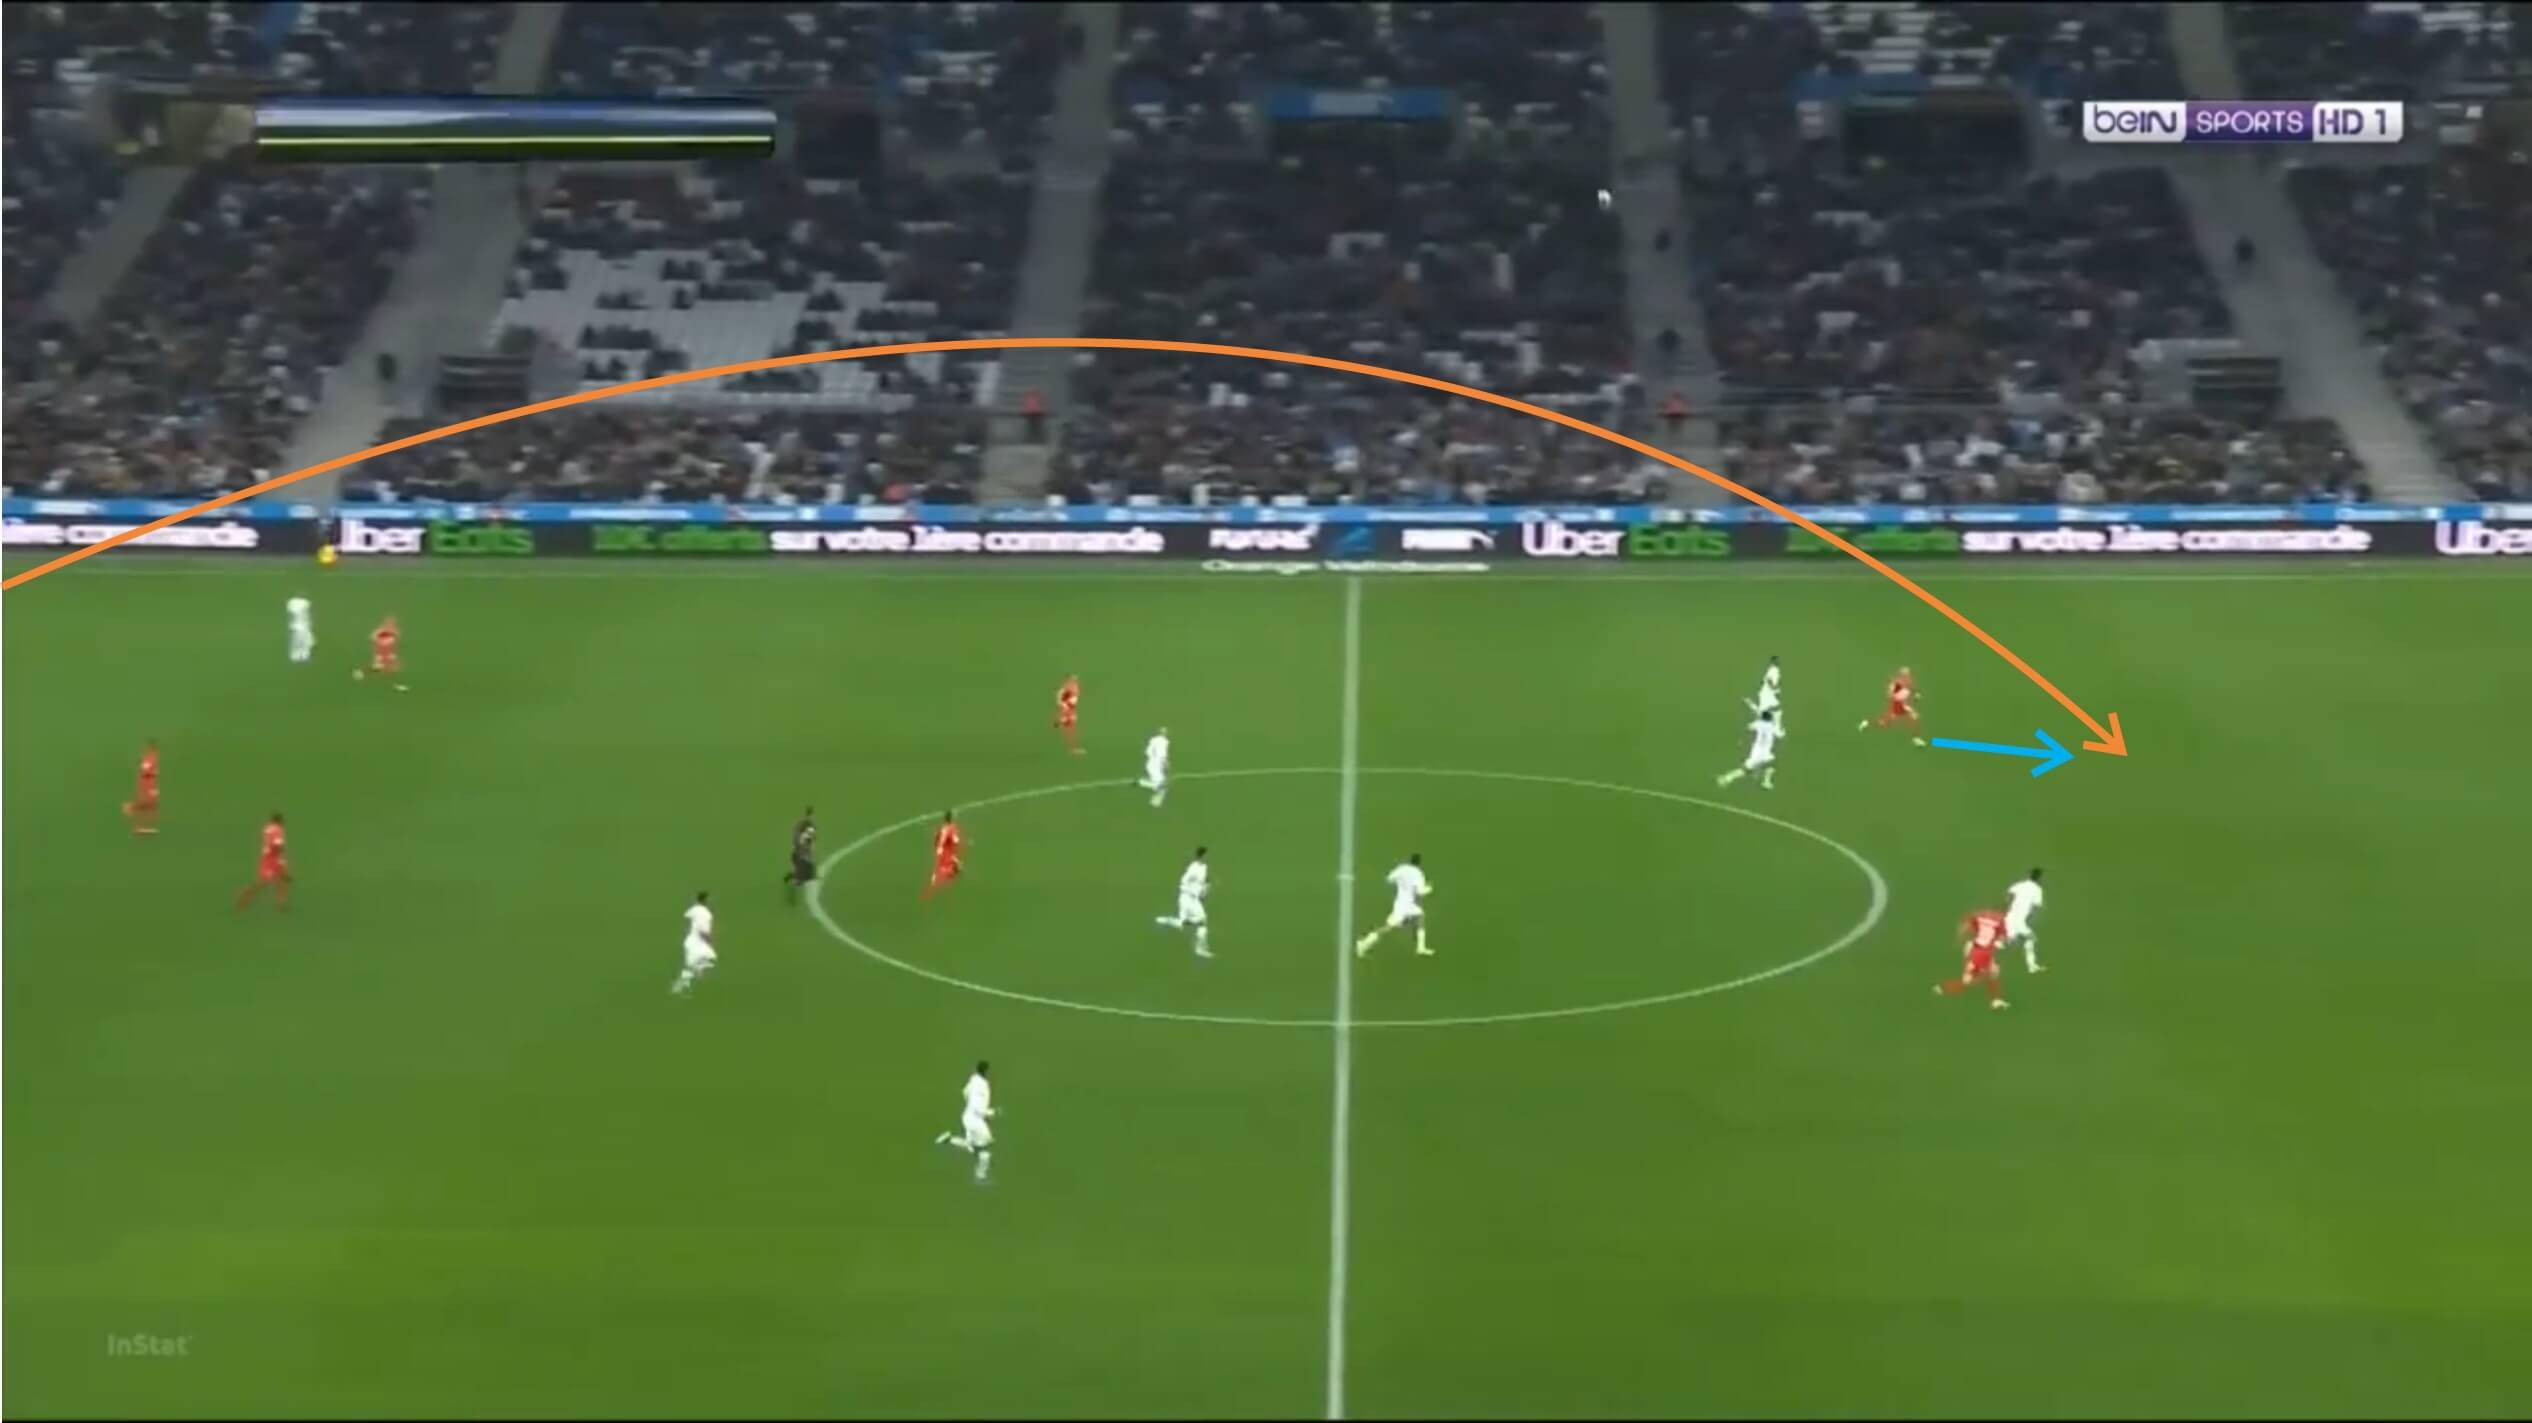 Gautier Larsonneur 2019/20 - scout report - tactical analysis tactics